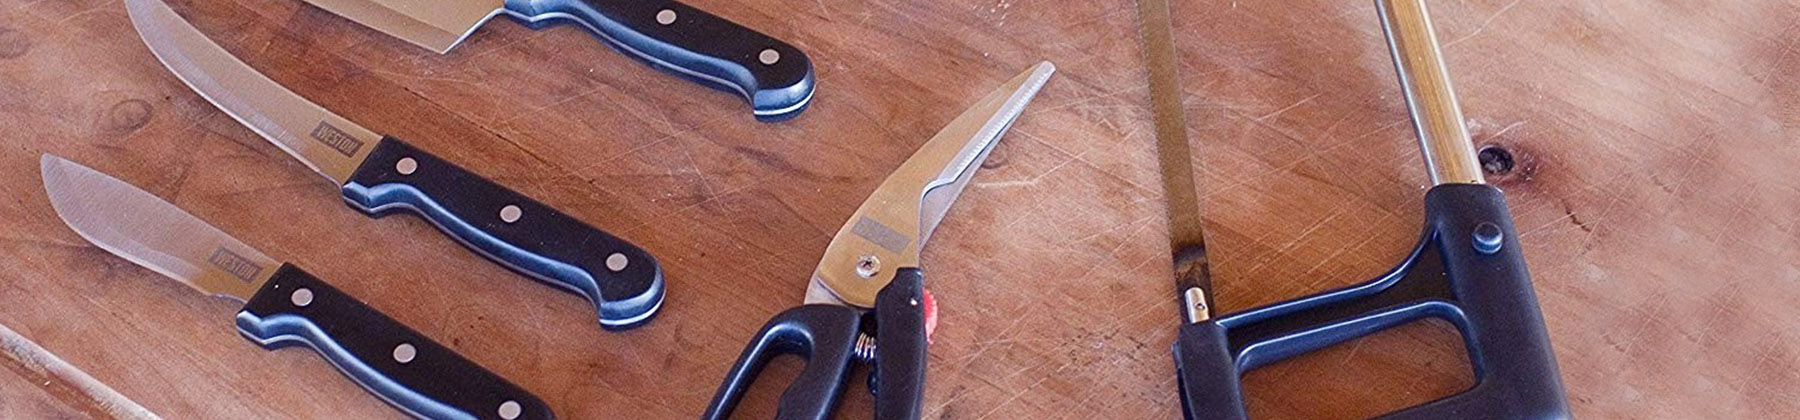 Photo of knife sets.